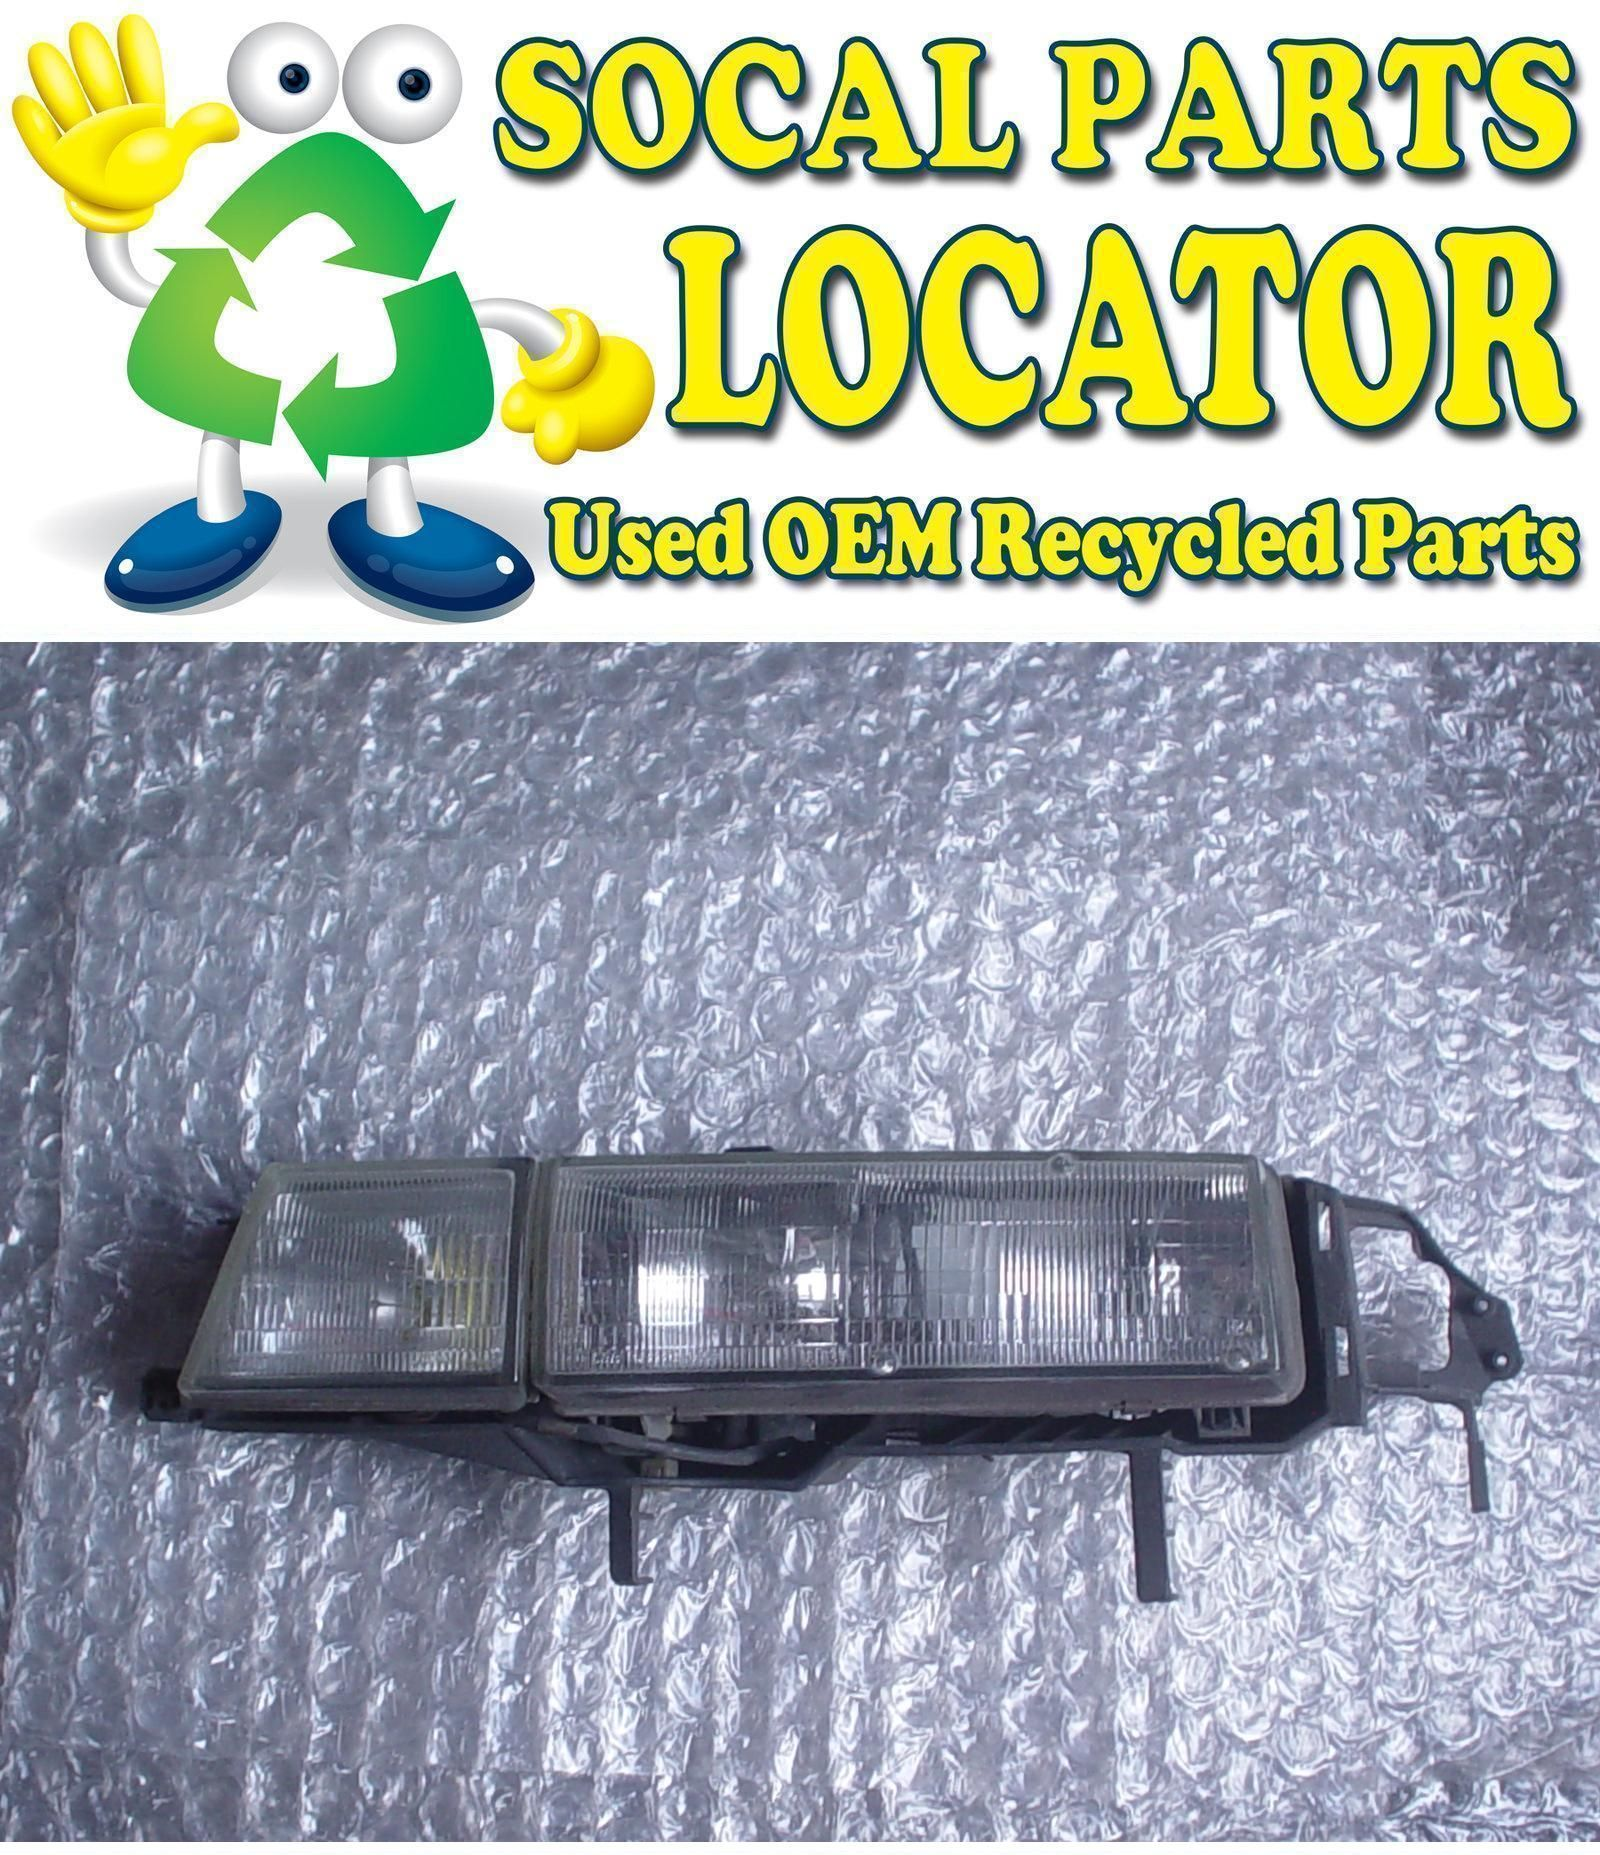 ACURA VIGOR LH HEADLIGHT HEADLAMP WITH FOG LAMP USED OEM So - Acura vigor parts